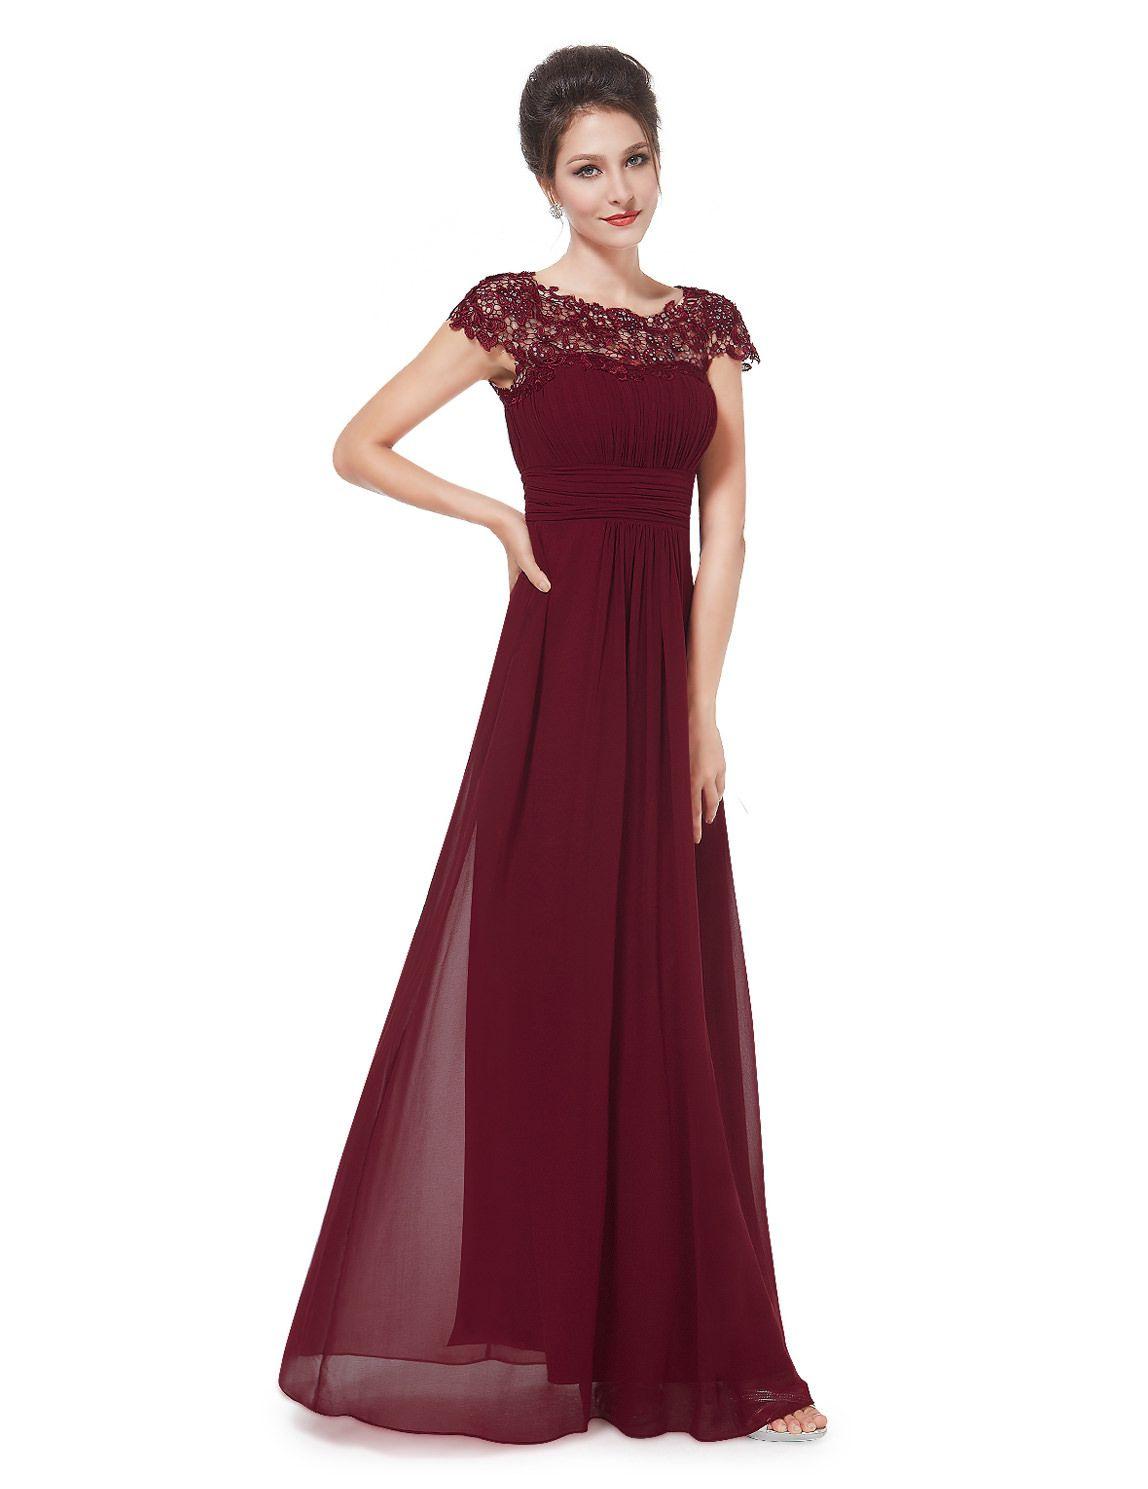 Abend Genial Abendkleid Bordeaux Rot für 2019Designer Luxus Abendkleid Bordeaux Rot Bester Preis